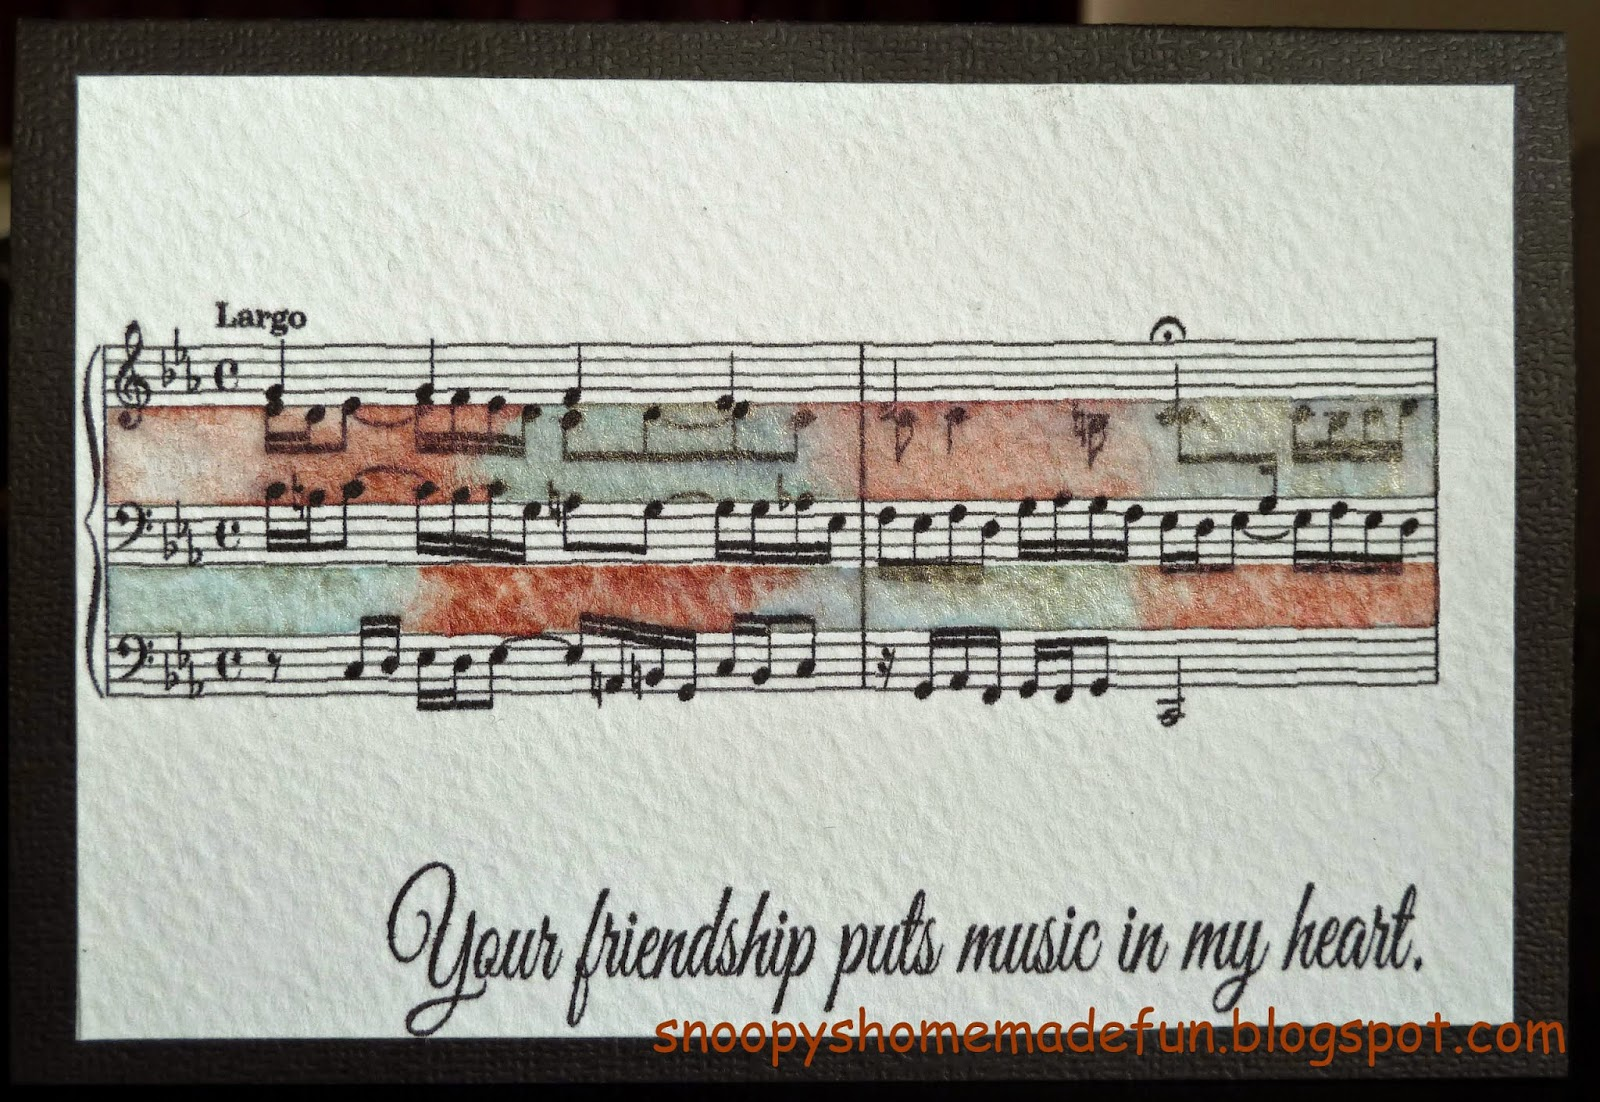 http://2.bp.blogspot.com/-8cJldxS2bVw/U1tJBsOeoKI/AAAAAAAARh4/T_M48LCRii8/s1600/2014+~+04+APRIL+Snoopydance+Watercolor+Music+Card+1.jpg